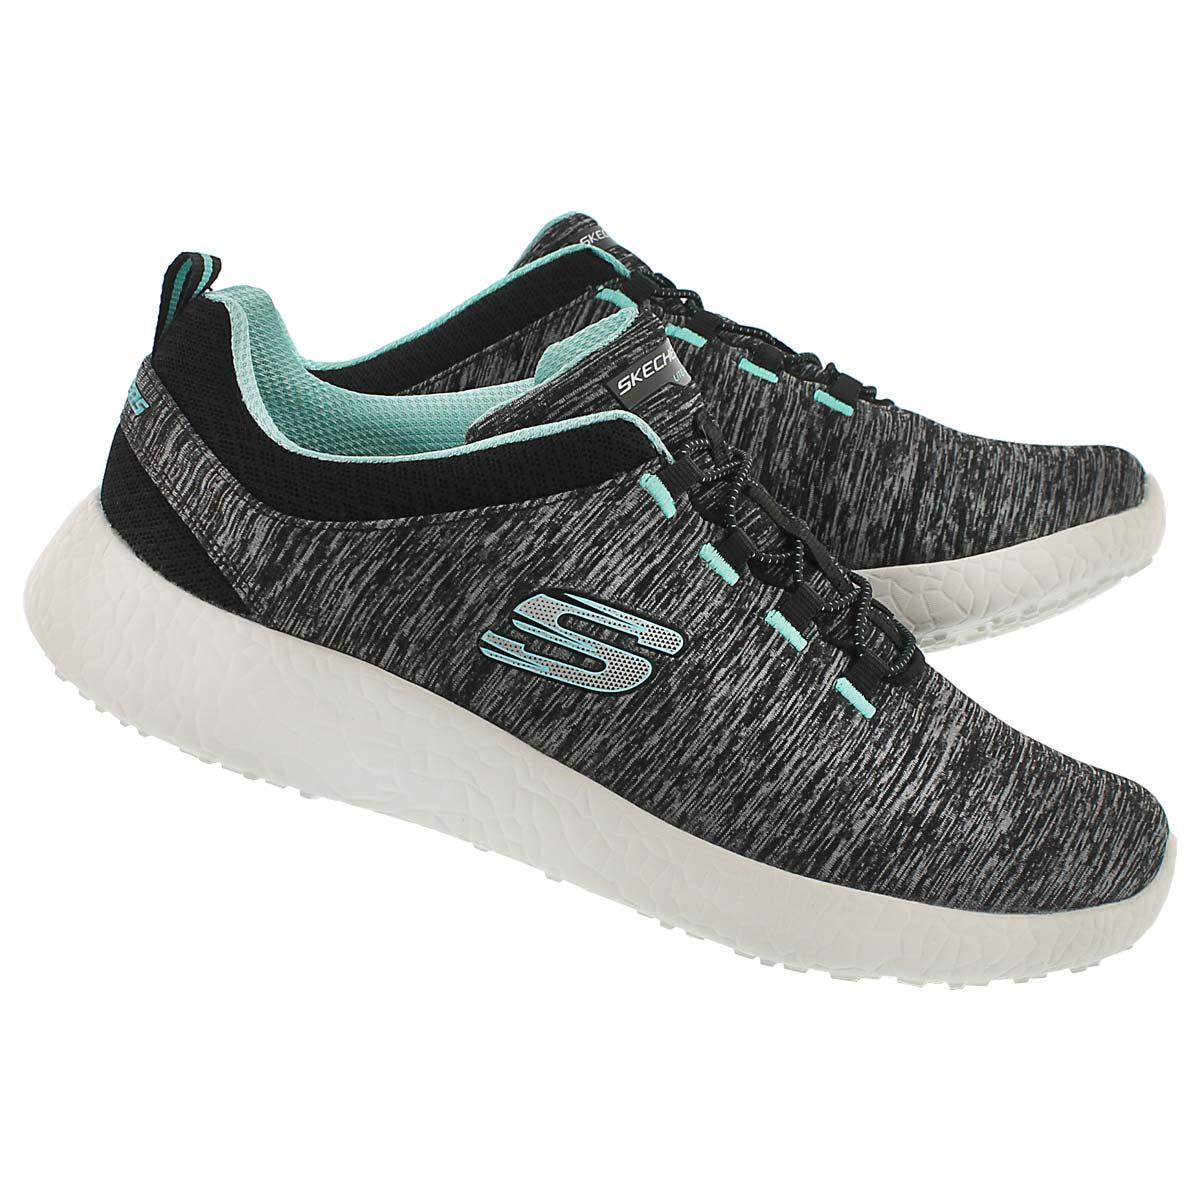 Lds Equinox blk/turq bungee running shoe